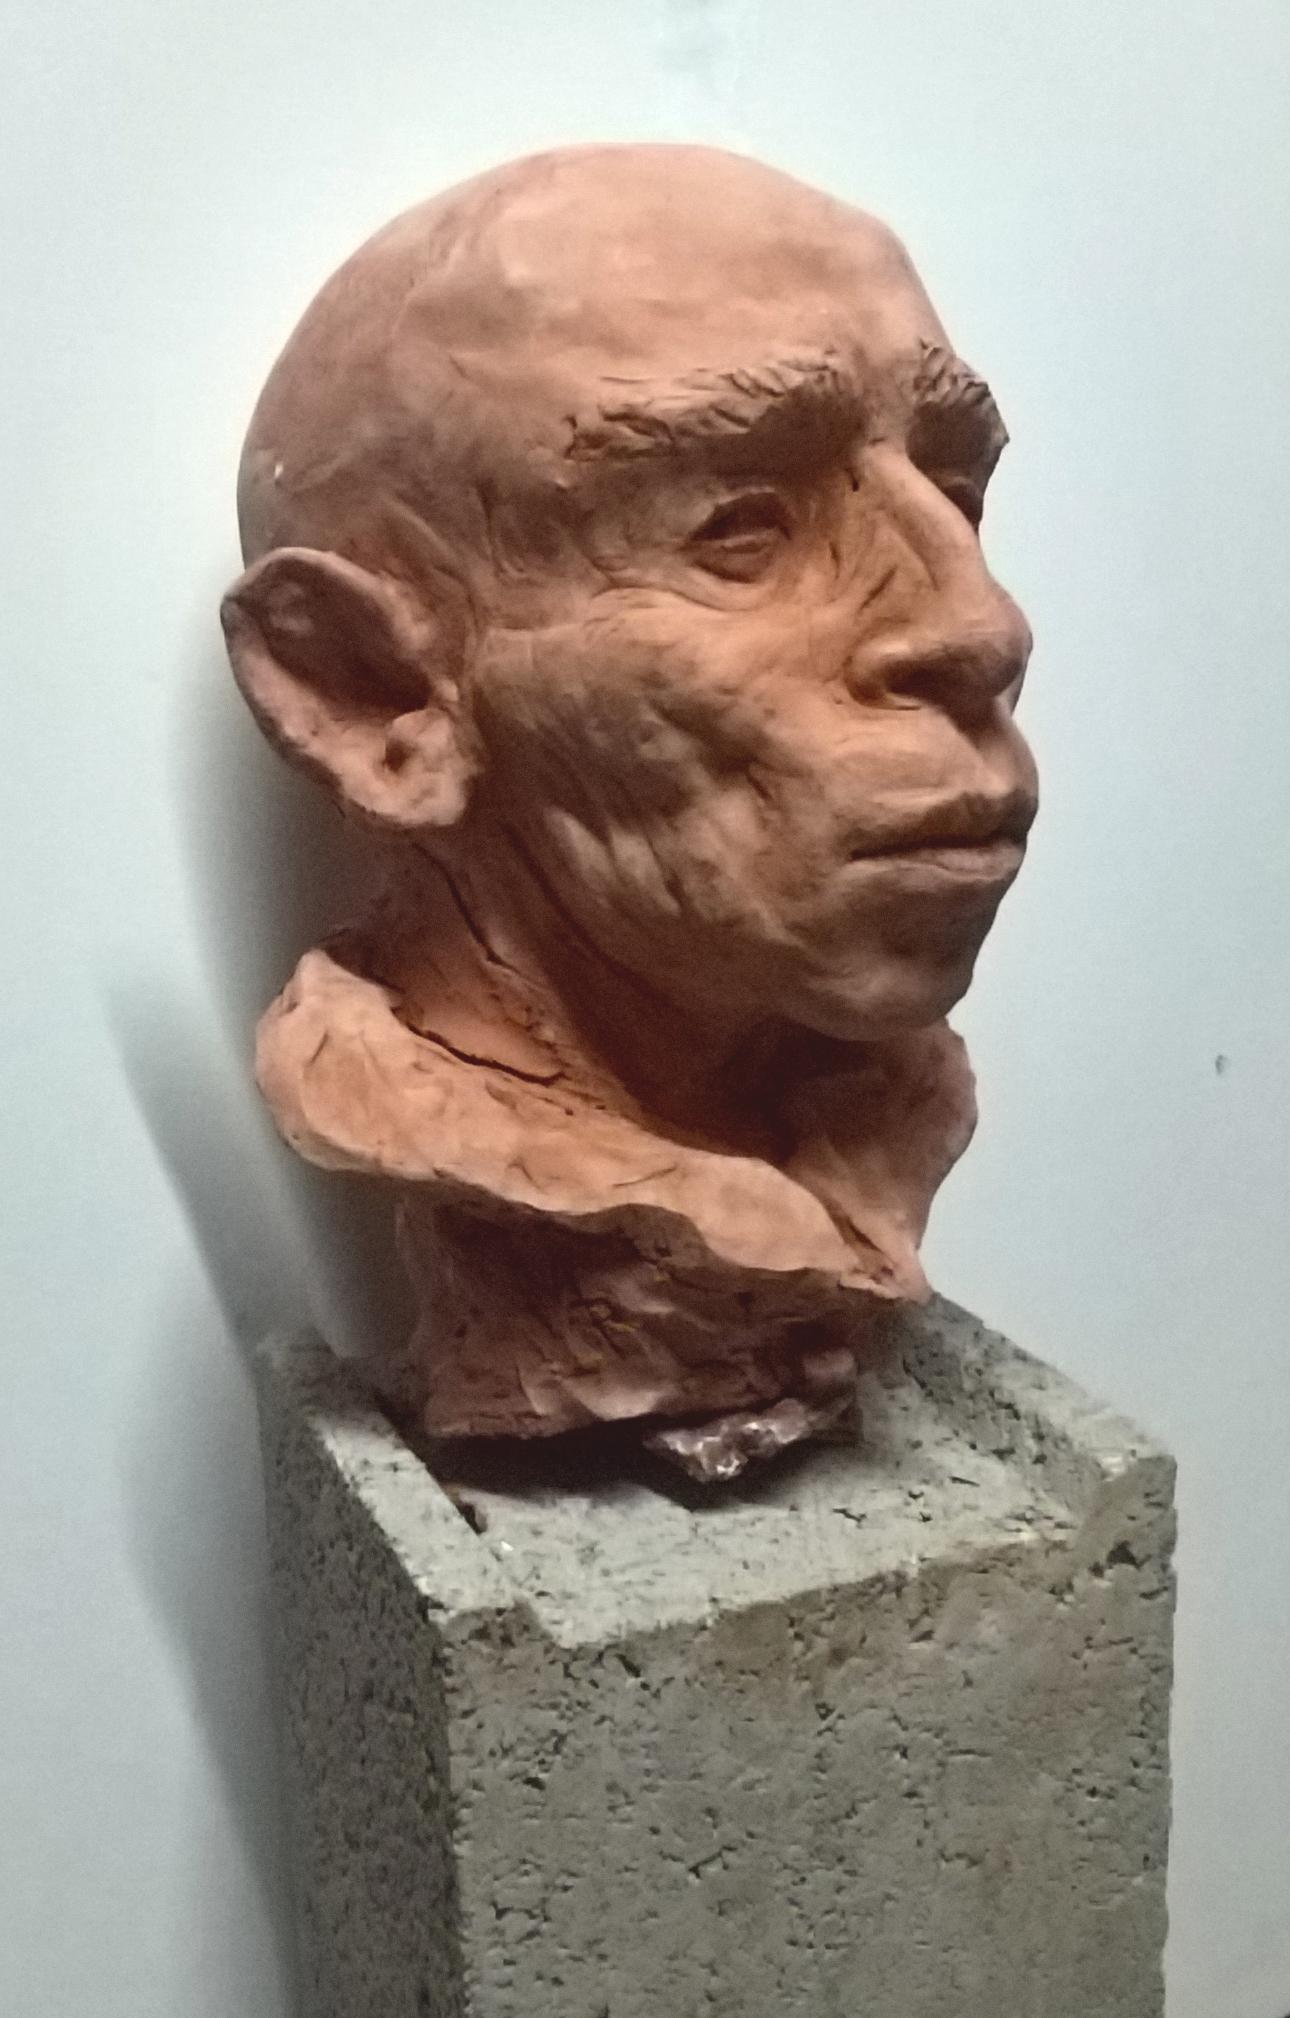 The lucky man clay